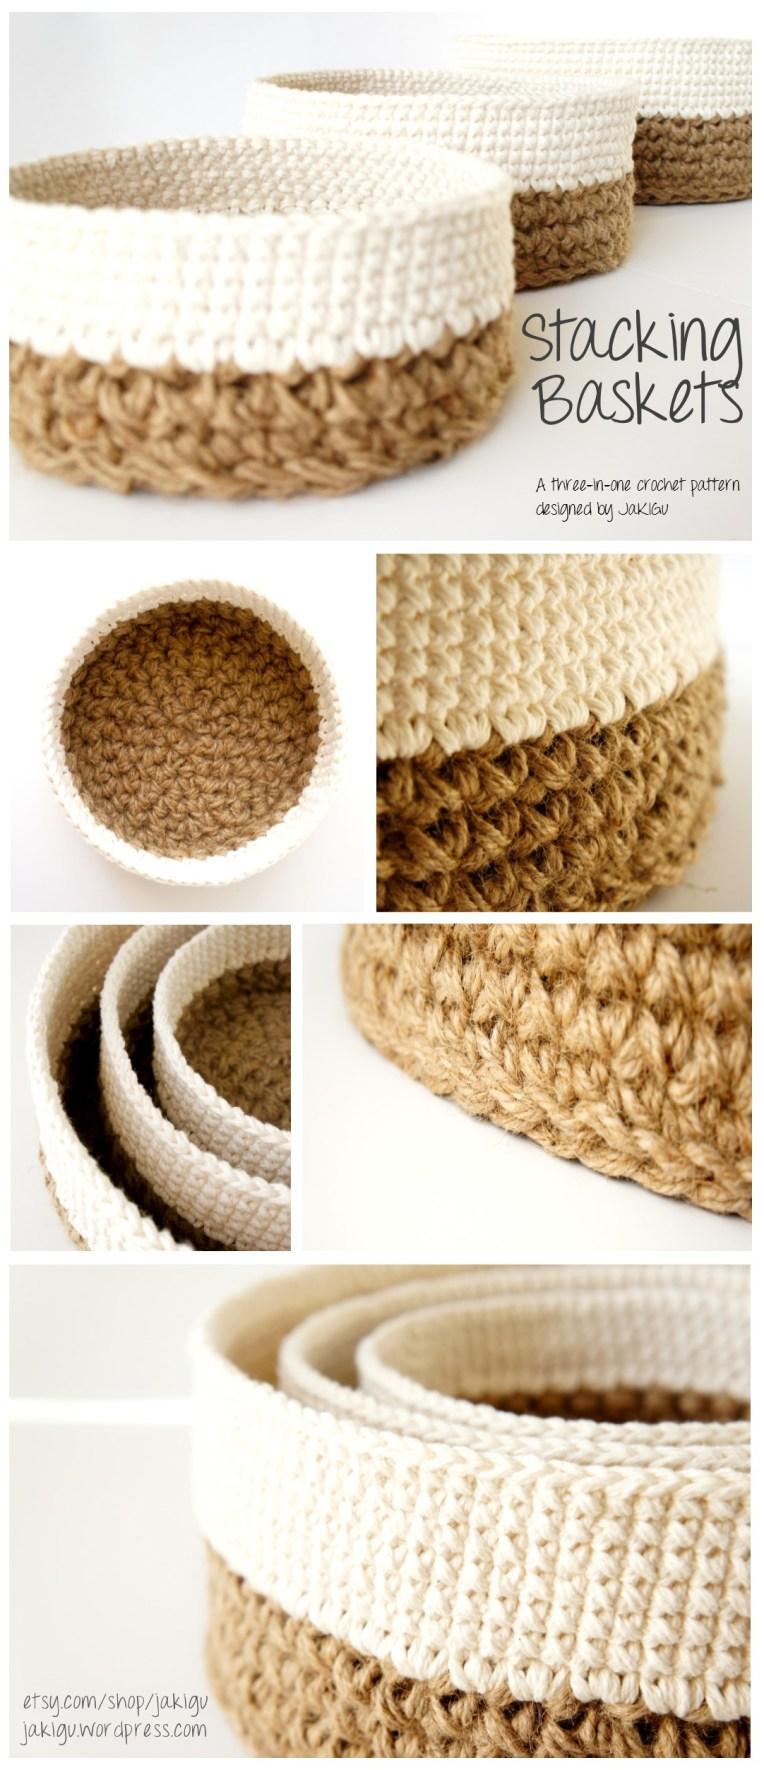 Stacking Baskets Crochet Pattern Designed by JaKiGu